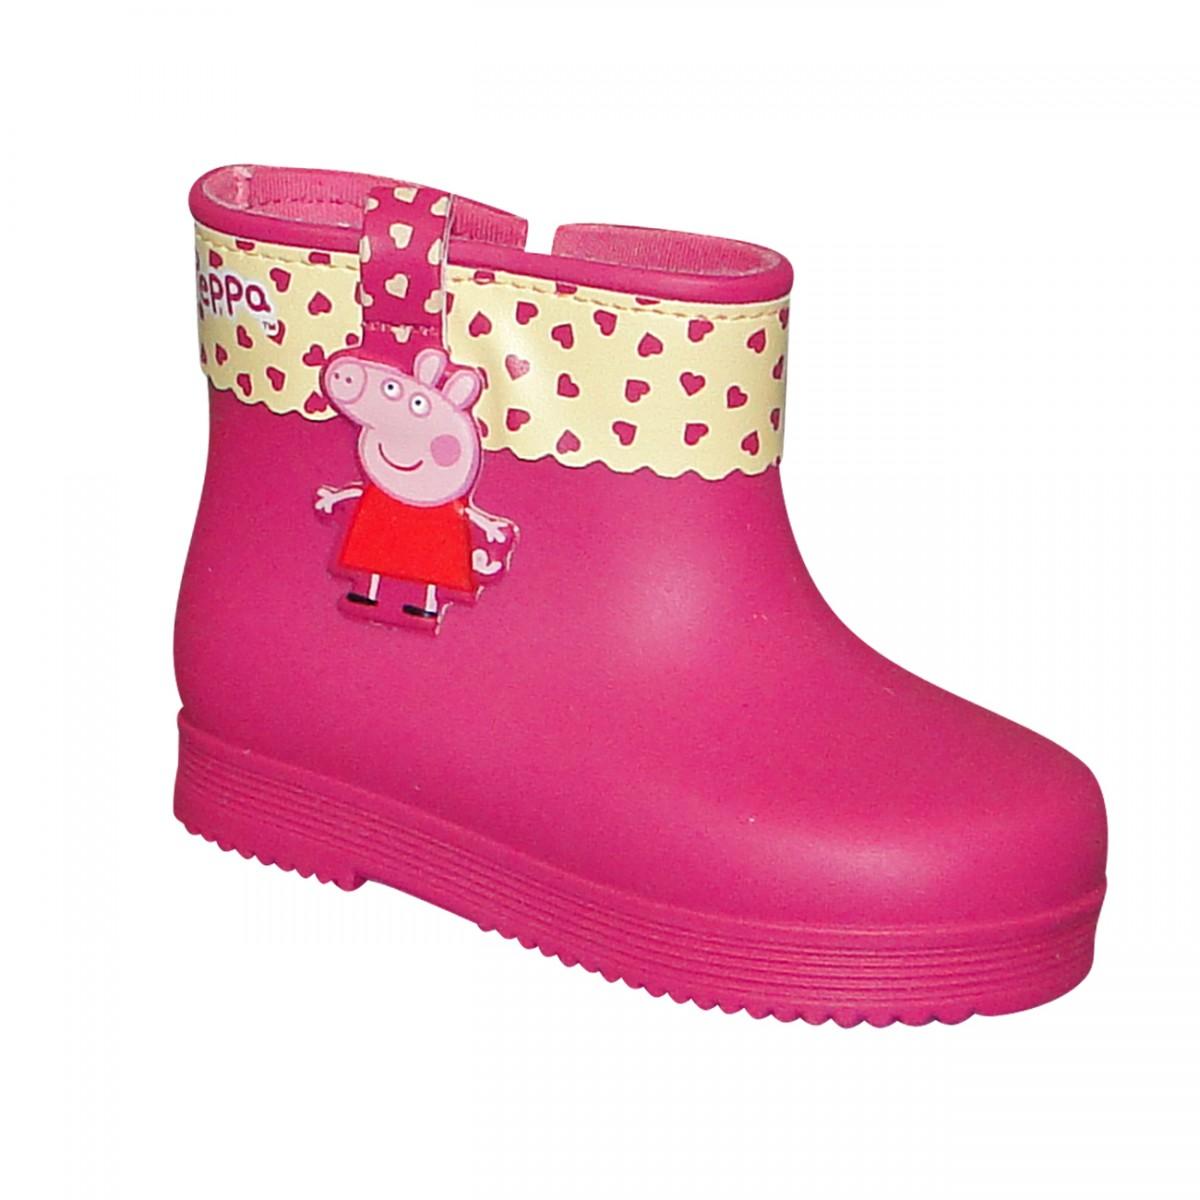 eb5f02a9c65 Bota Peppa e George 21277 Infantil 21277-51693 - Rosa Pink - Chuteira Nike